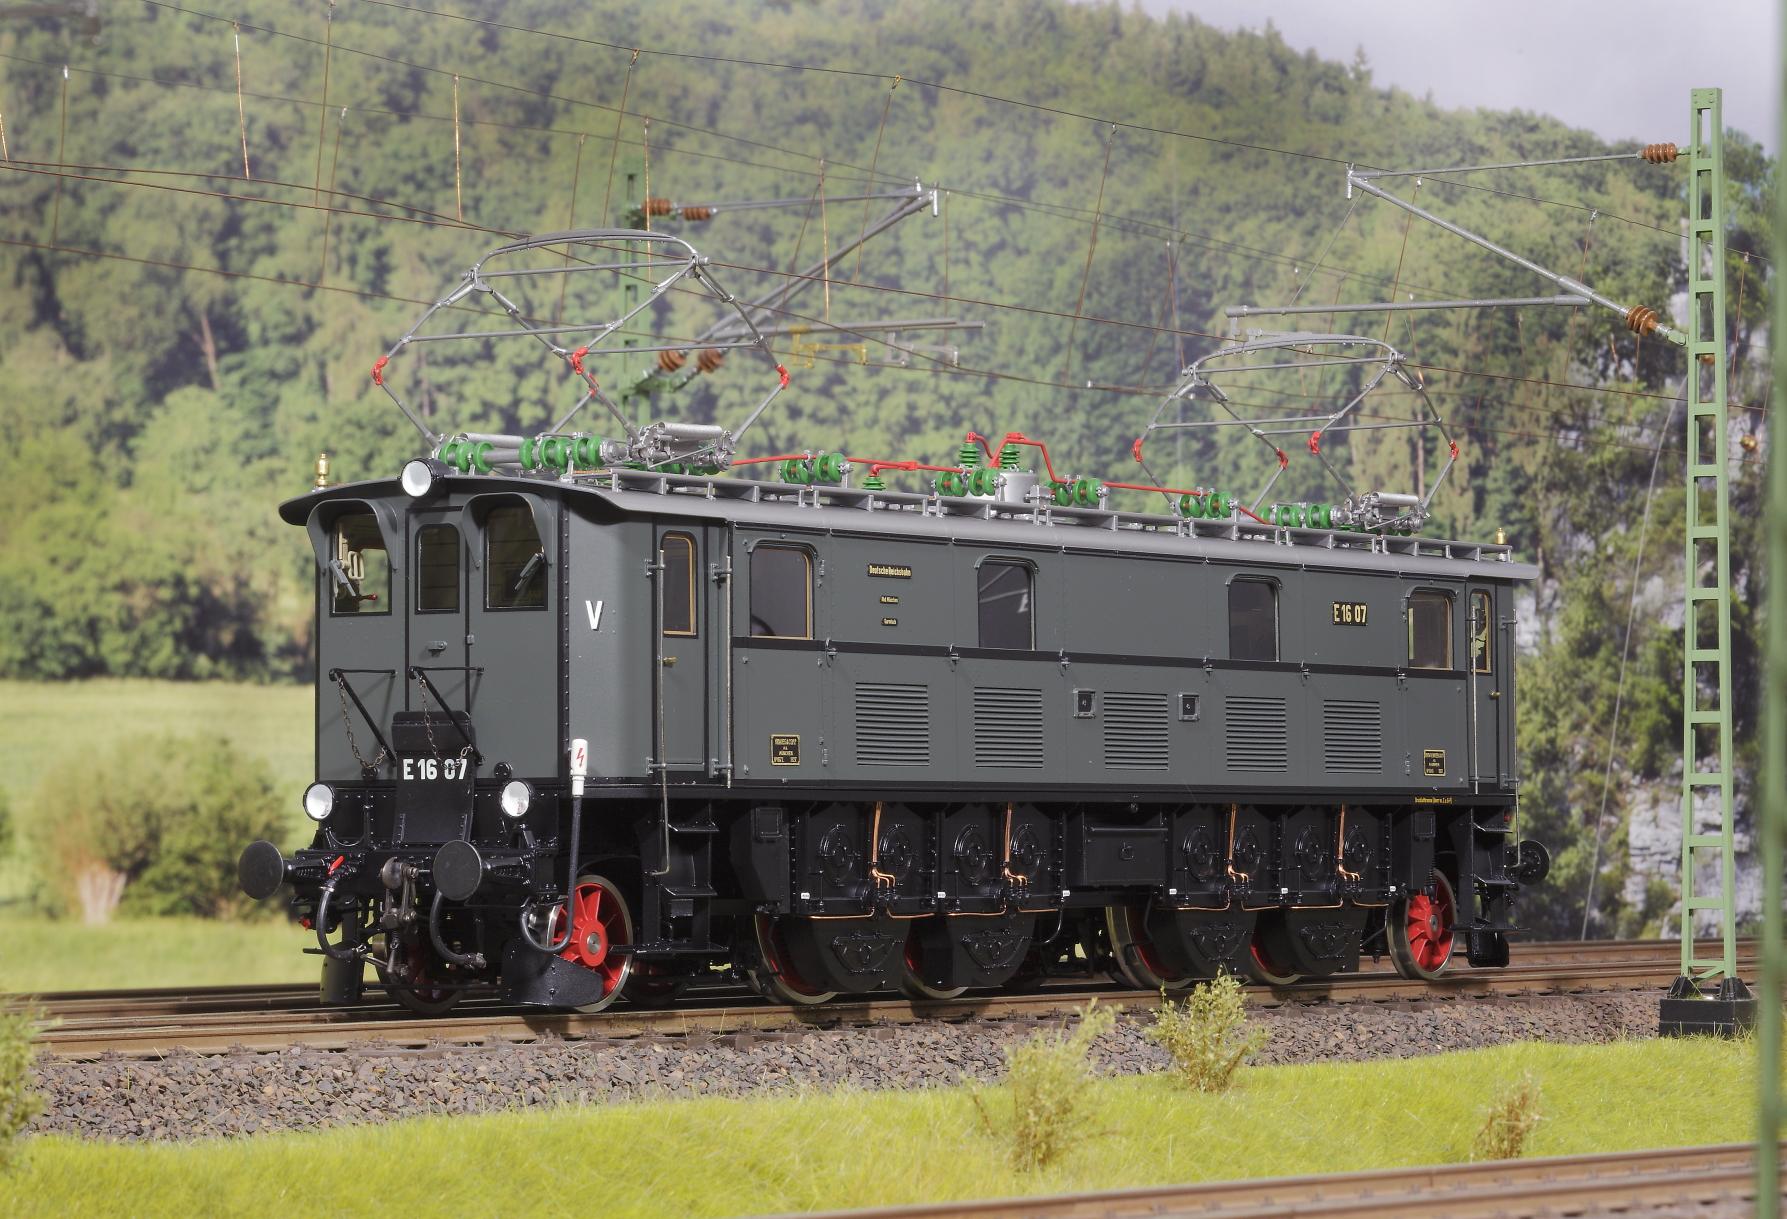 Spur 1 Lokomotive Baureihe E 16 07 Epoche IIb blaugrau